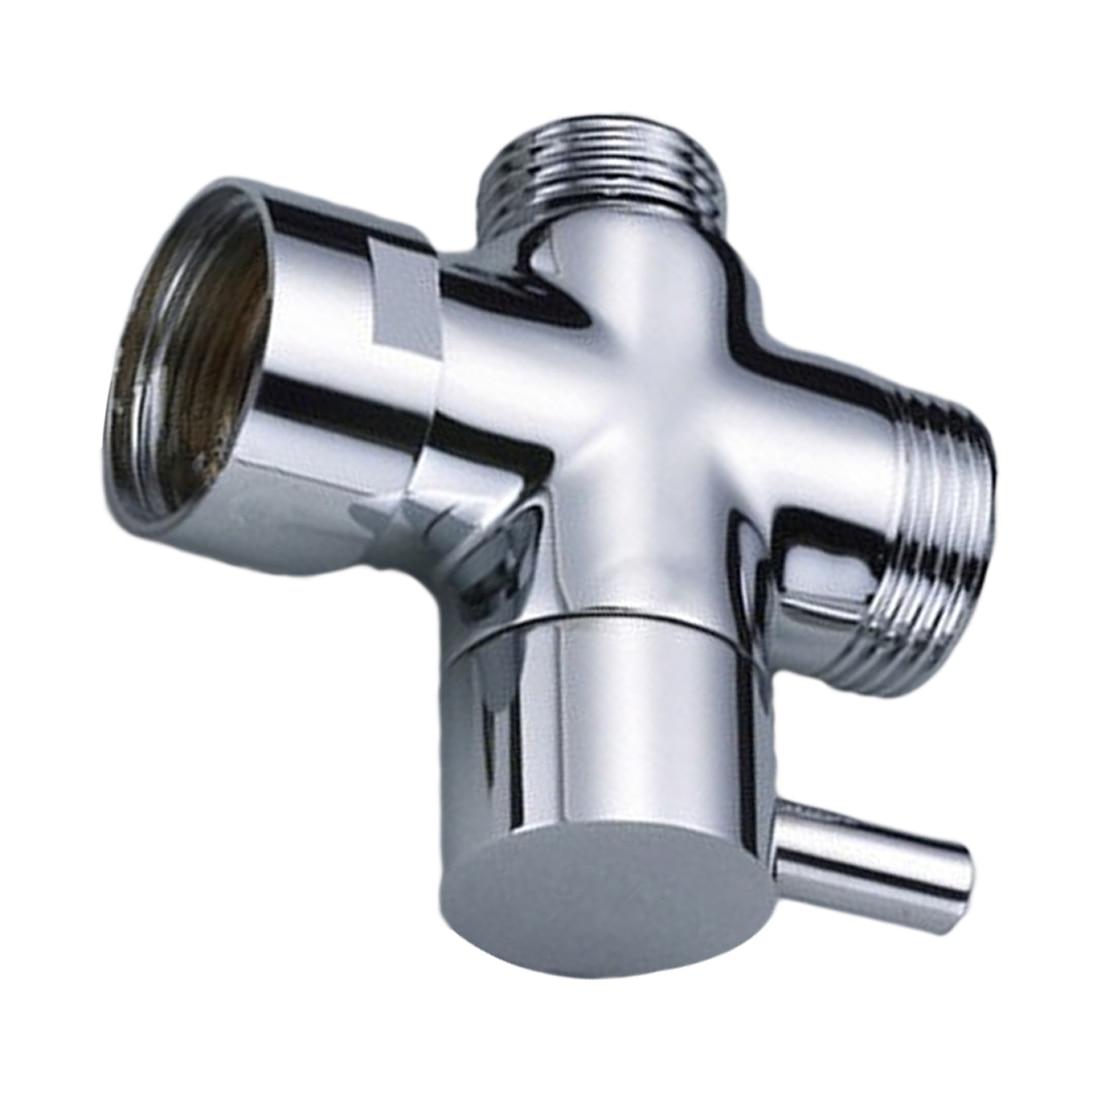 Water Separator Shower Tee Adapter Adjustable Shower Head Diverter Valve 3 Way Plastic   Diverter Valve Bathroom Accessories